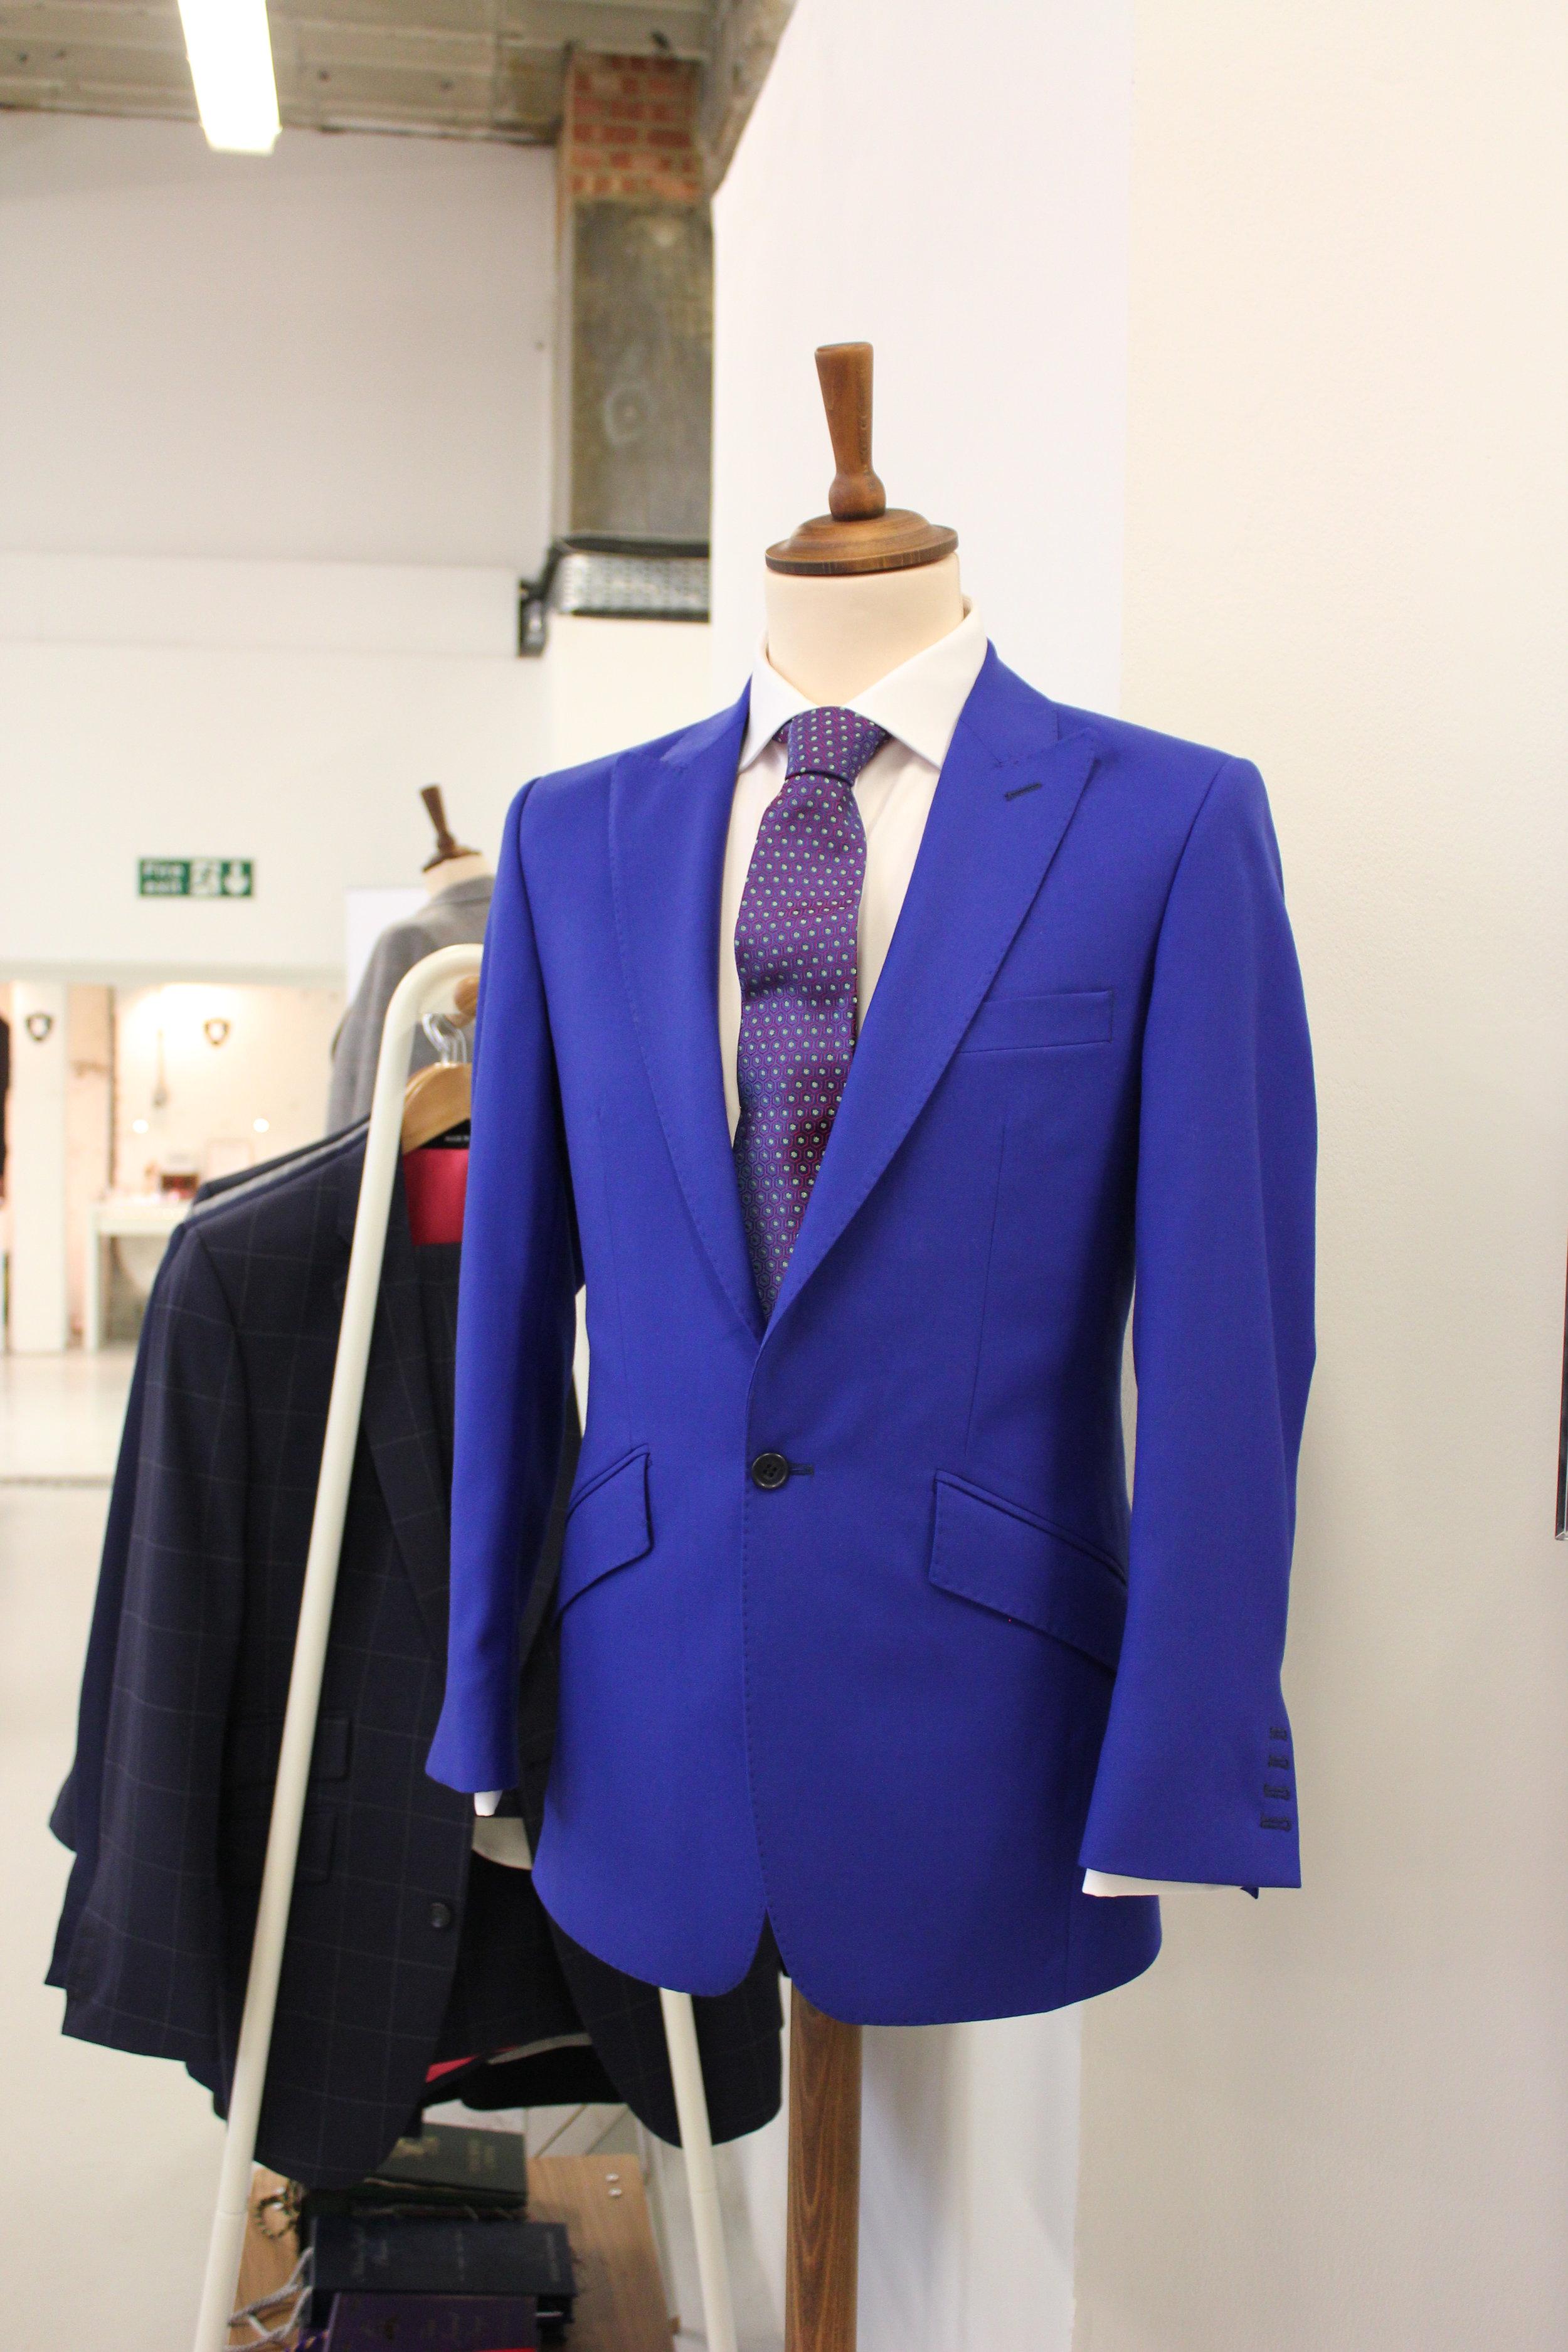 blue-british-all-uk-made-bespoke-tailor-harrisons-wool-bright-suit-augustus-hare-tie-menswear.JPG